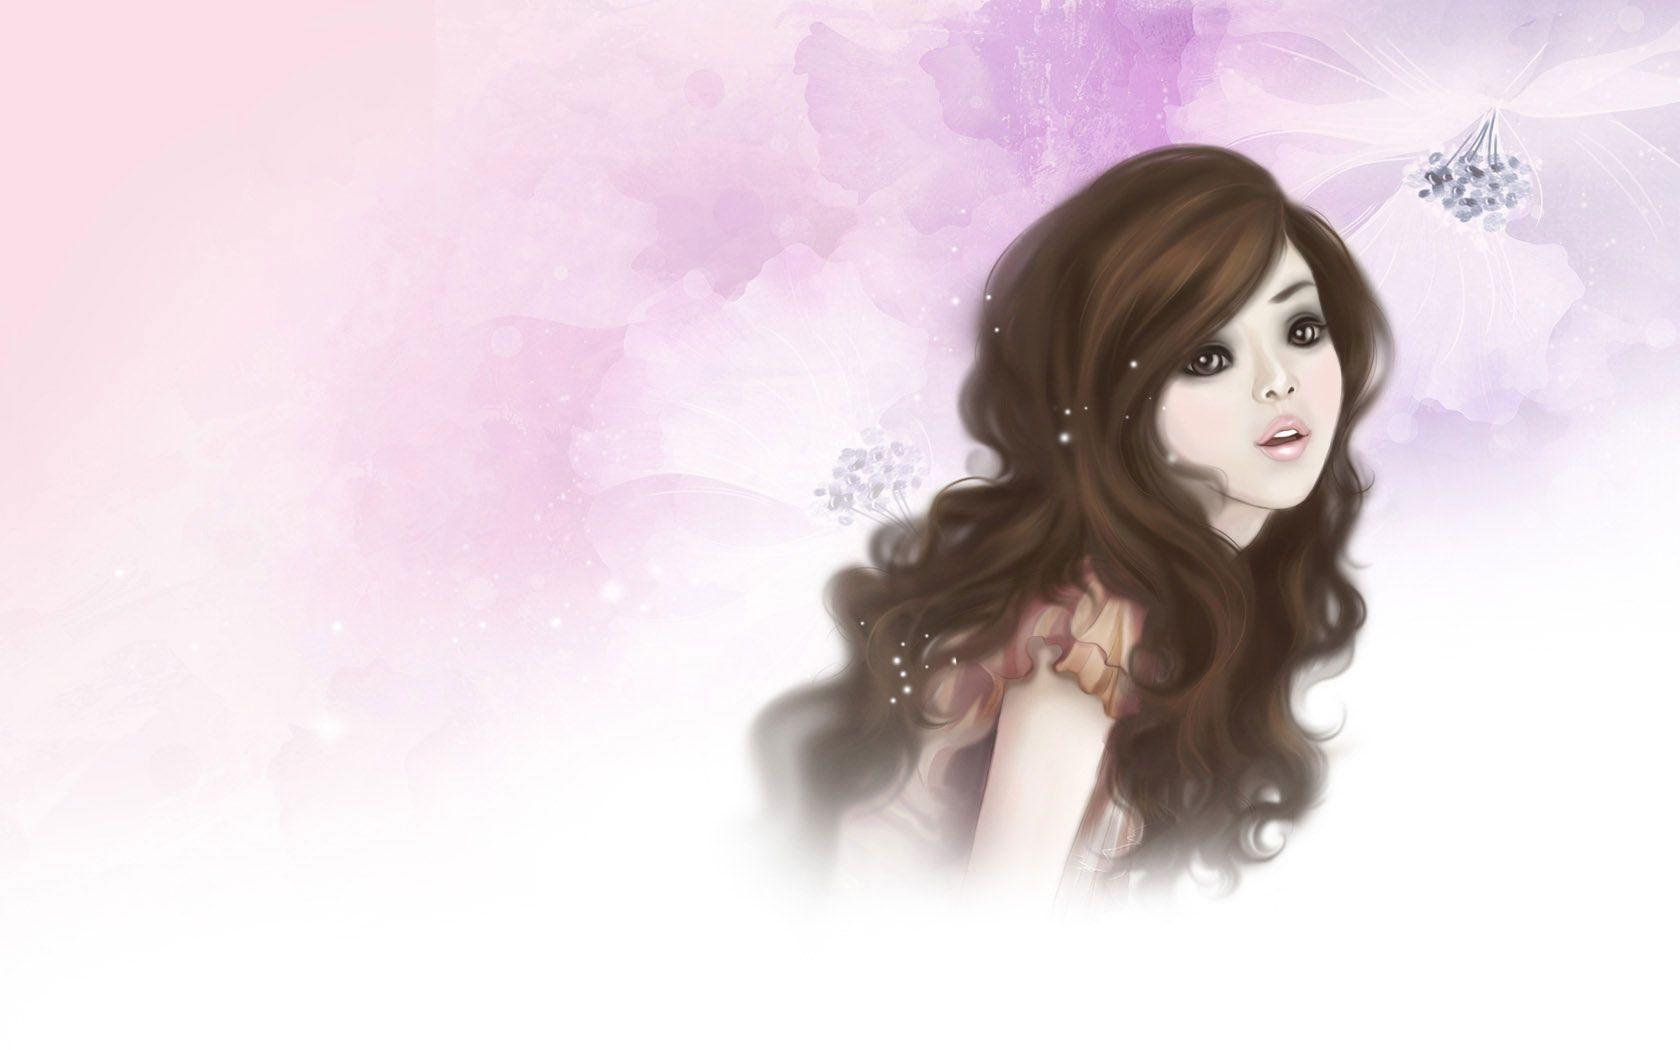 Cartoon Girl Wallpapers Top Free Cartoon Girl Backgrounds